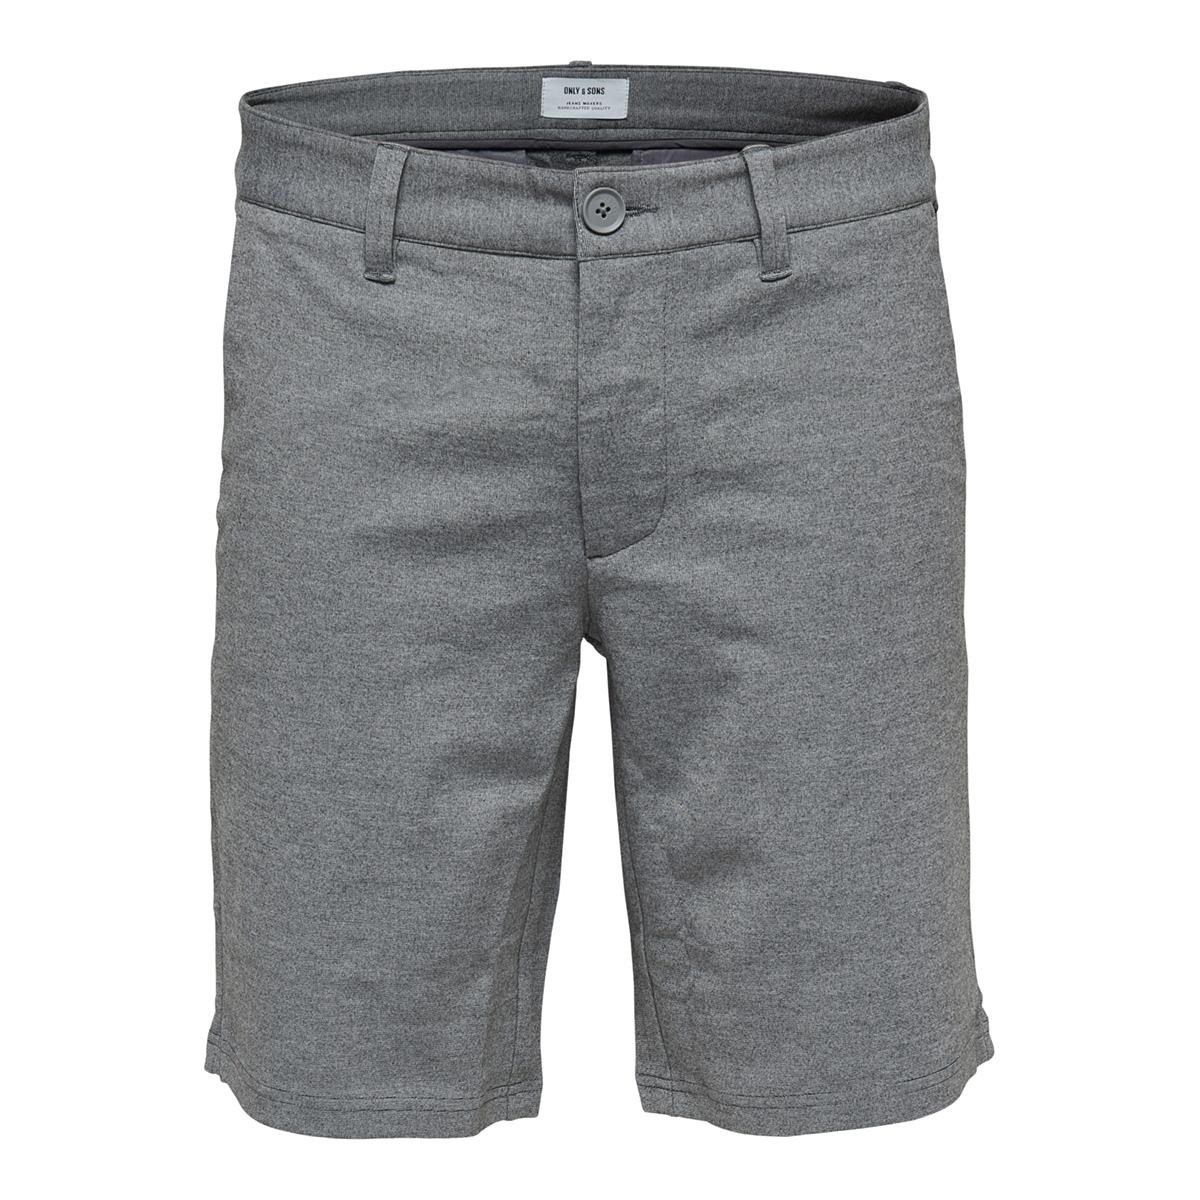 onsmark shorts gw 3786 noos 22013786 only & sons korte broek medium grey melange